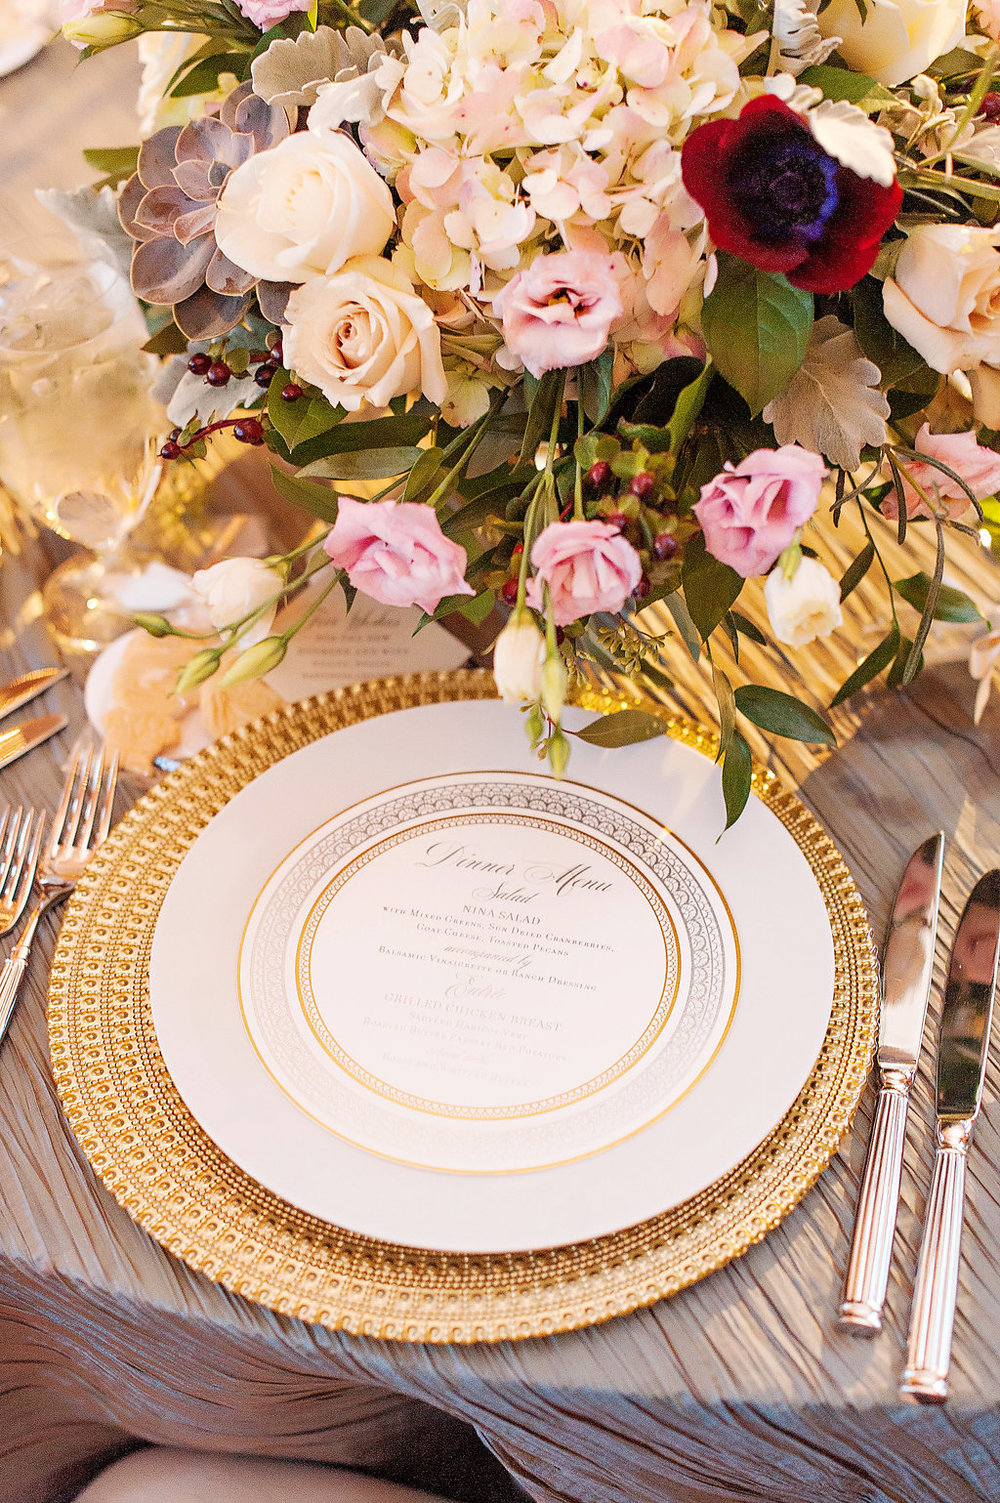 Kortnee Kate Photography | Custom circle wedding dinner menu by Poeme